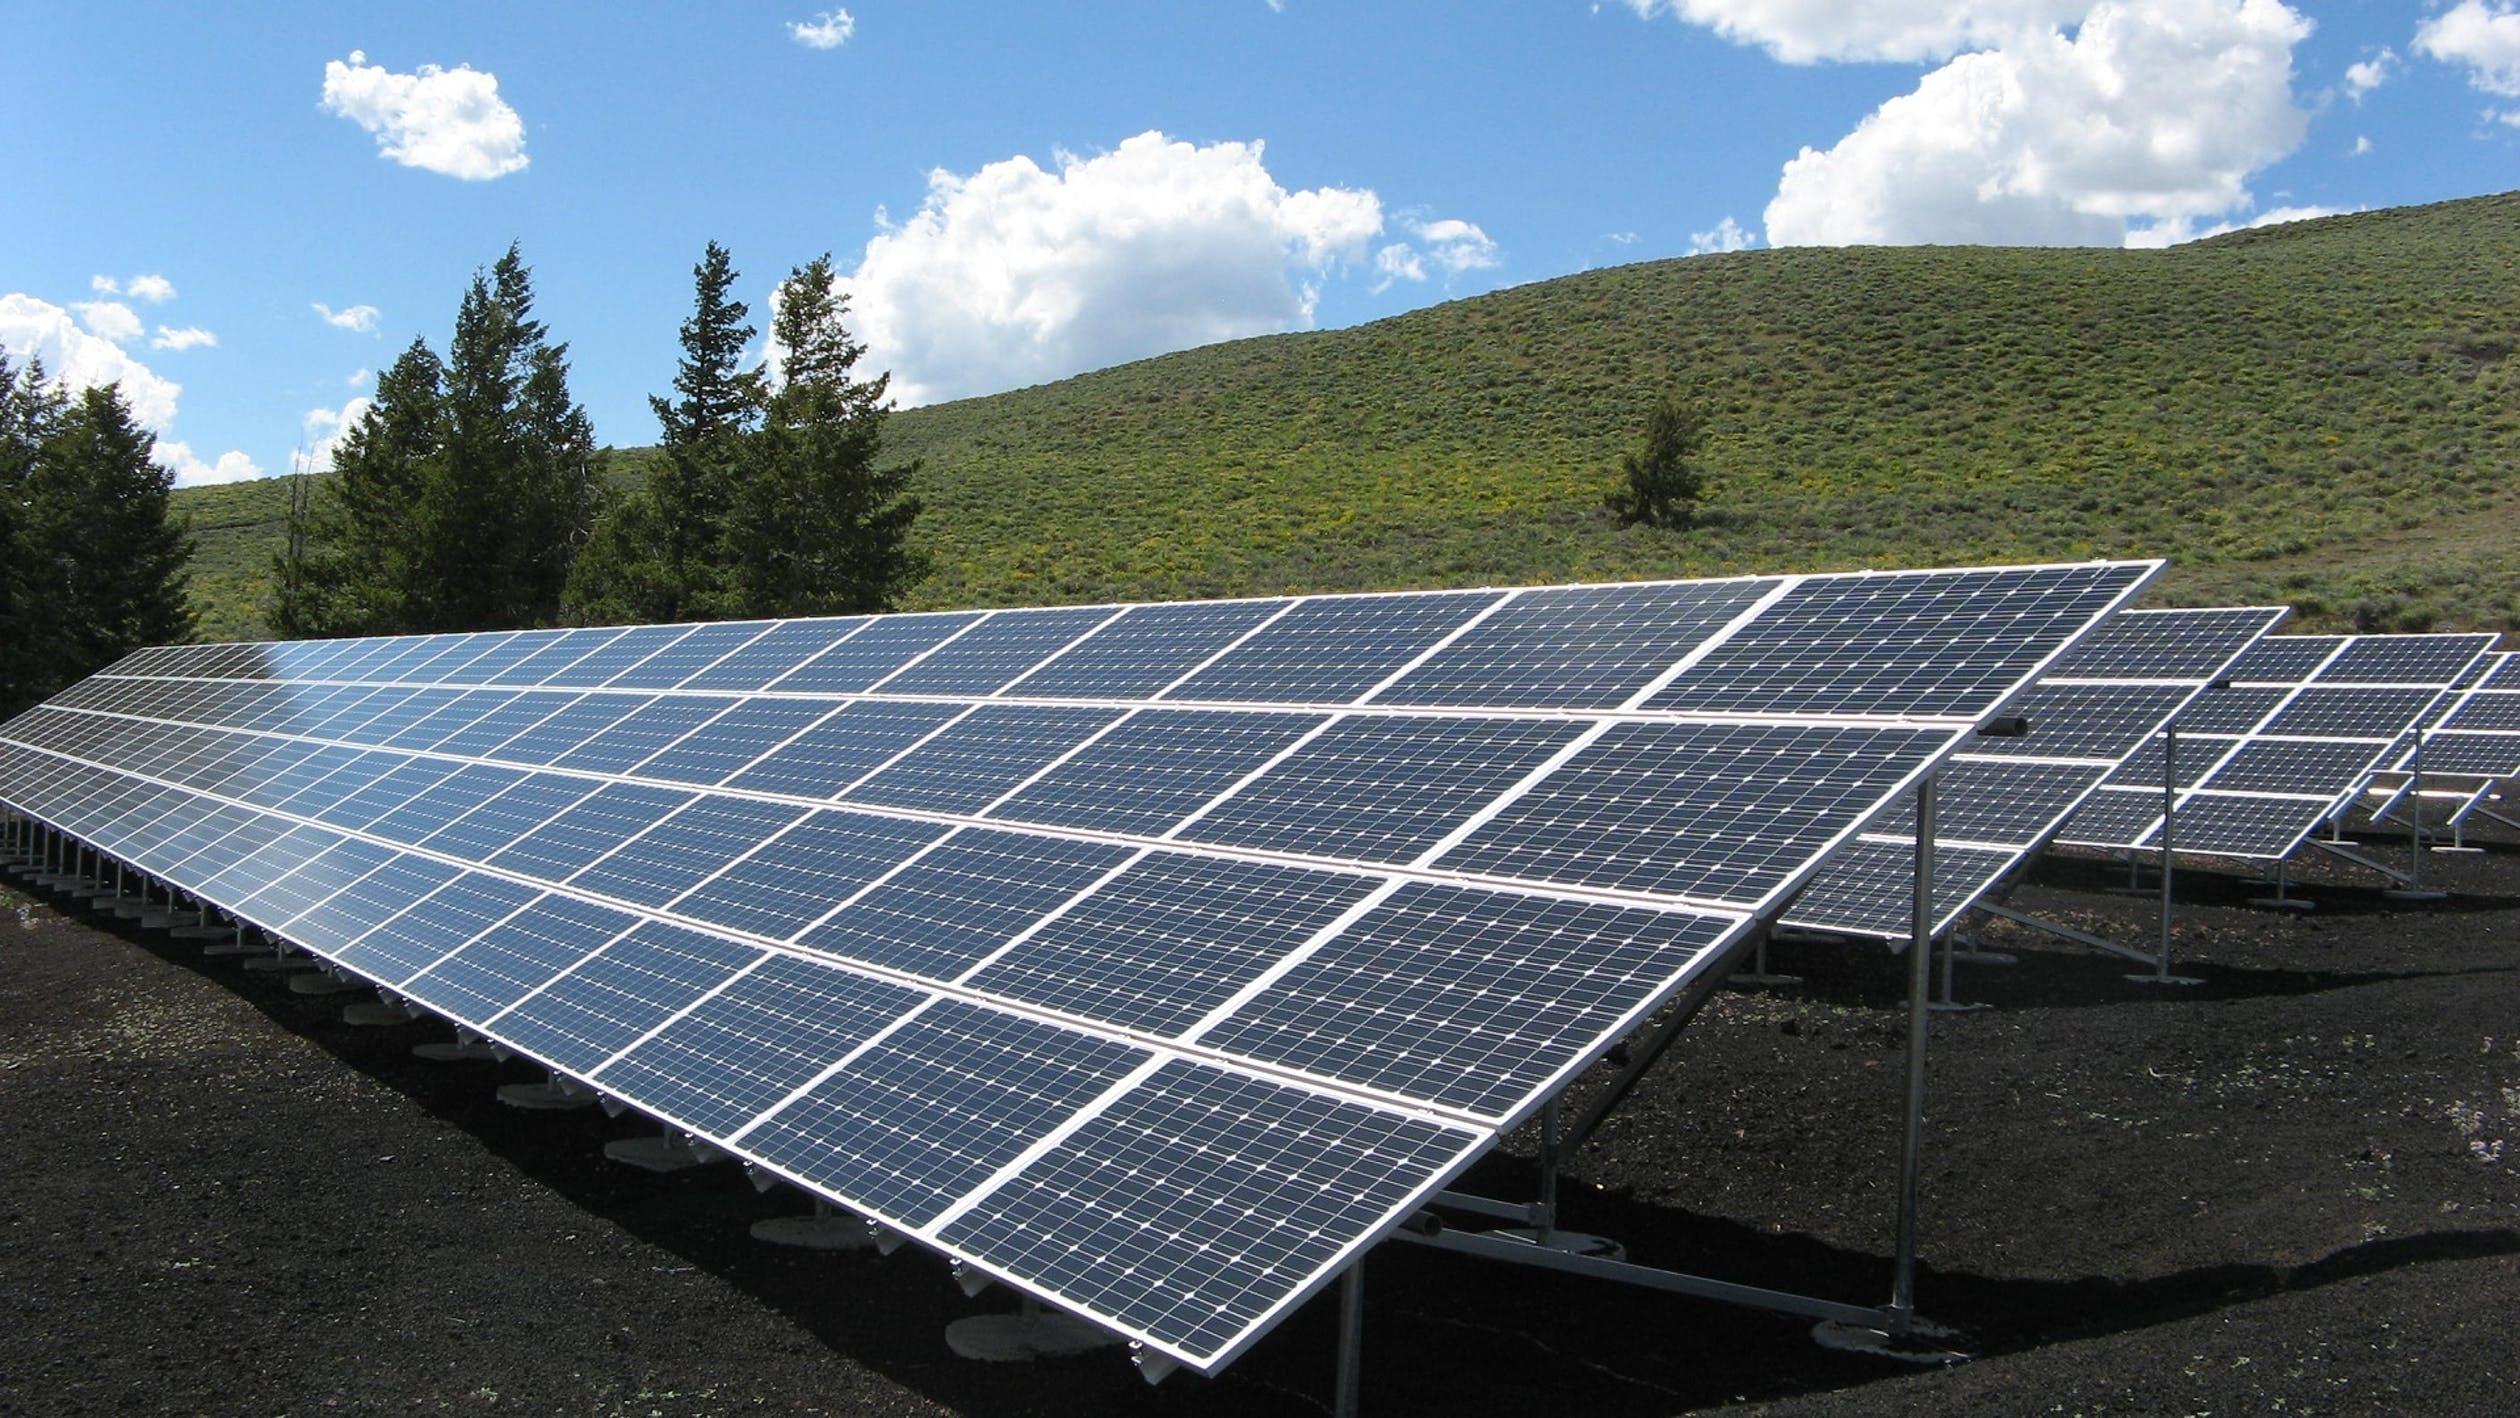 Btw-op-zonnepanelen-terugvragen.jpeg